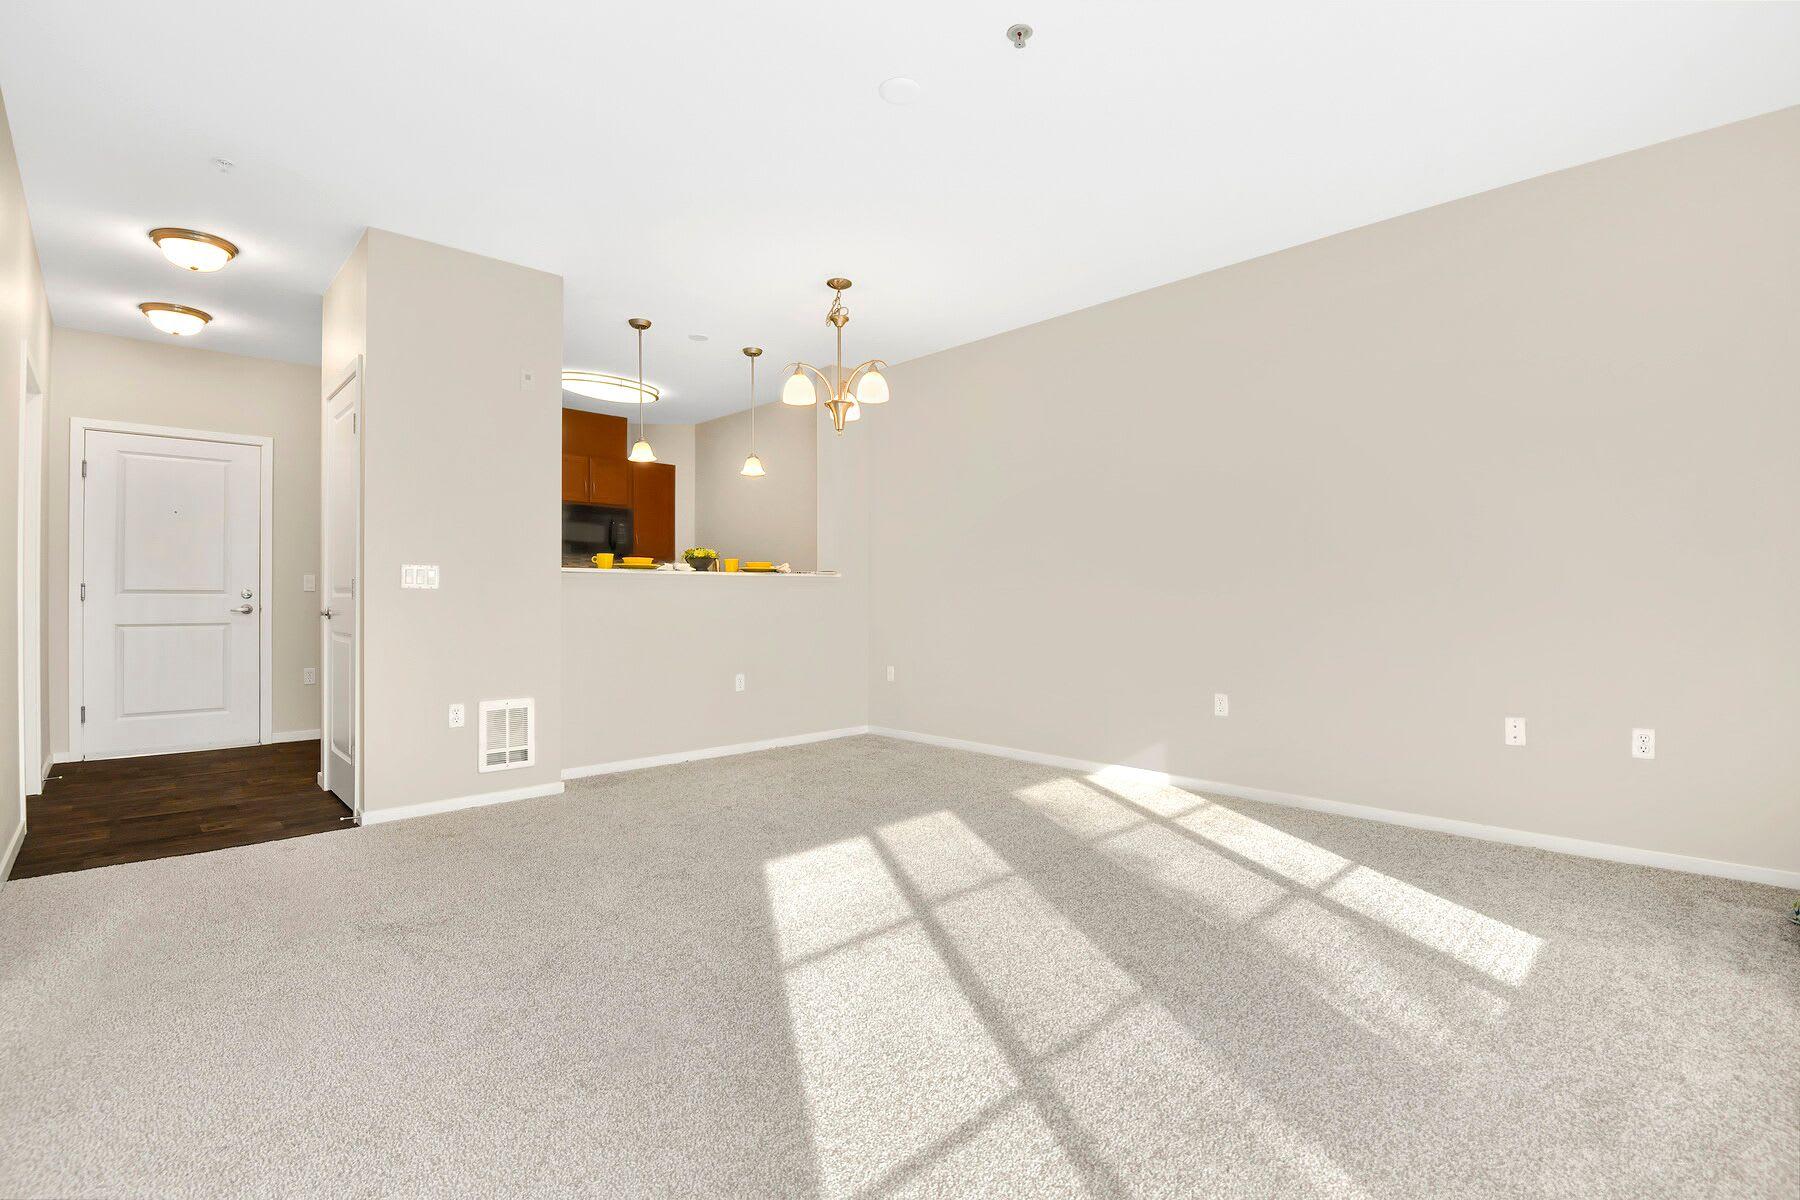 Open Floor Plan at Reunion at Redmond Ridge, Redmond, Washington